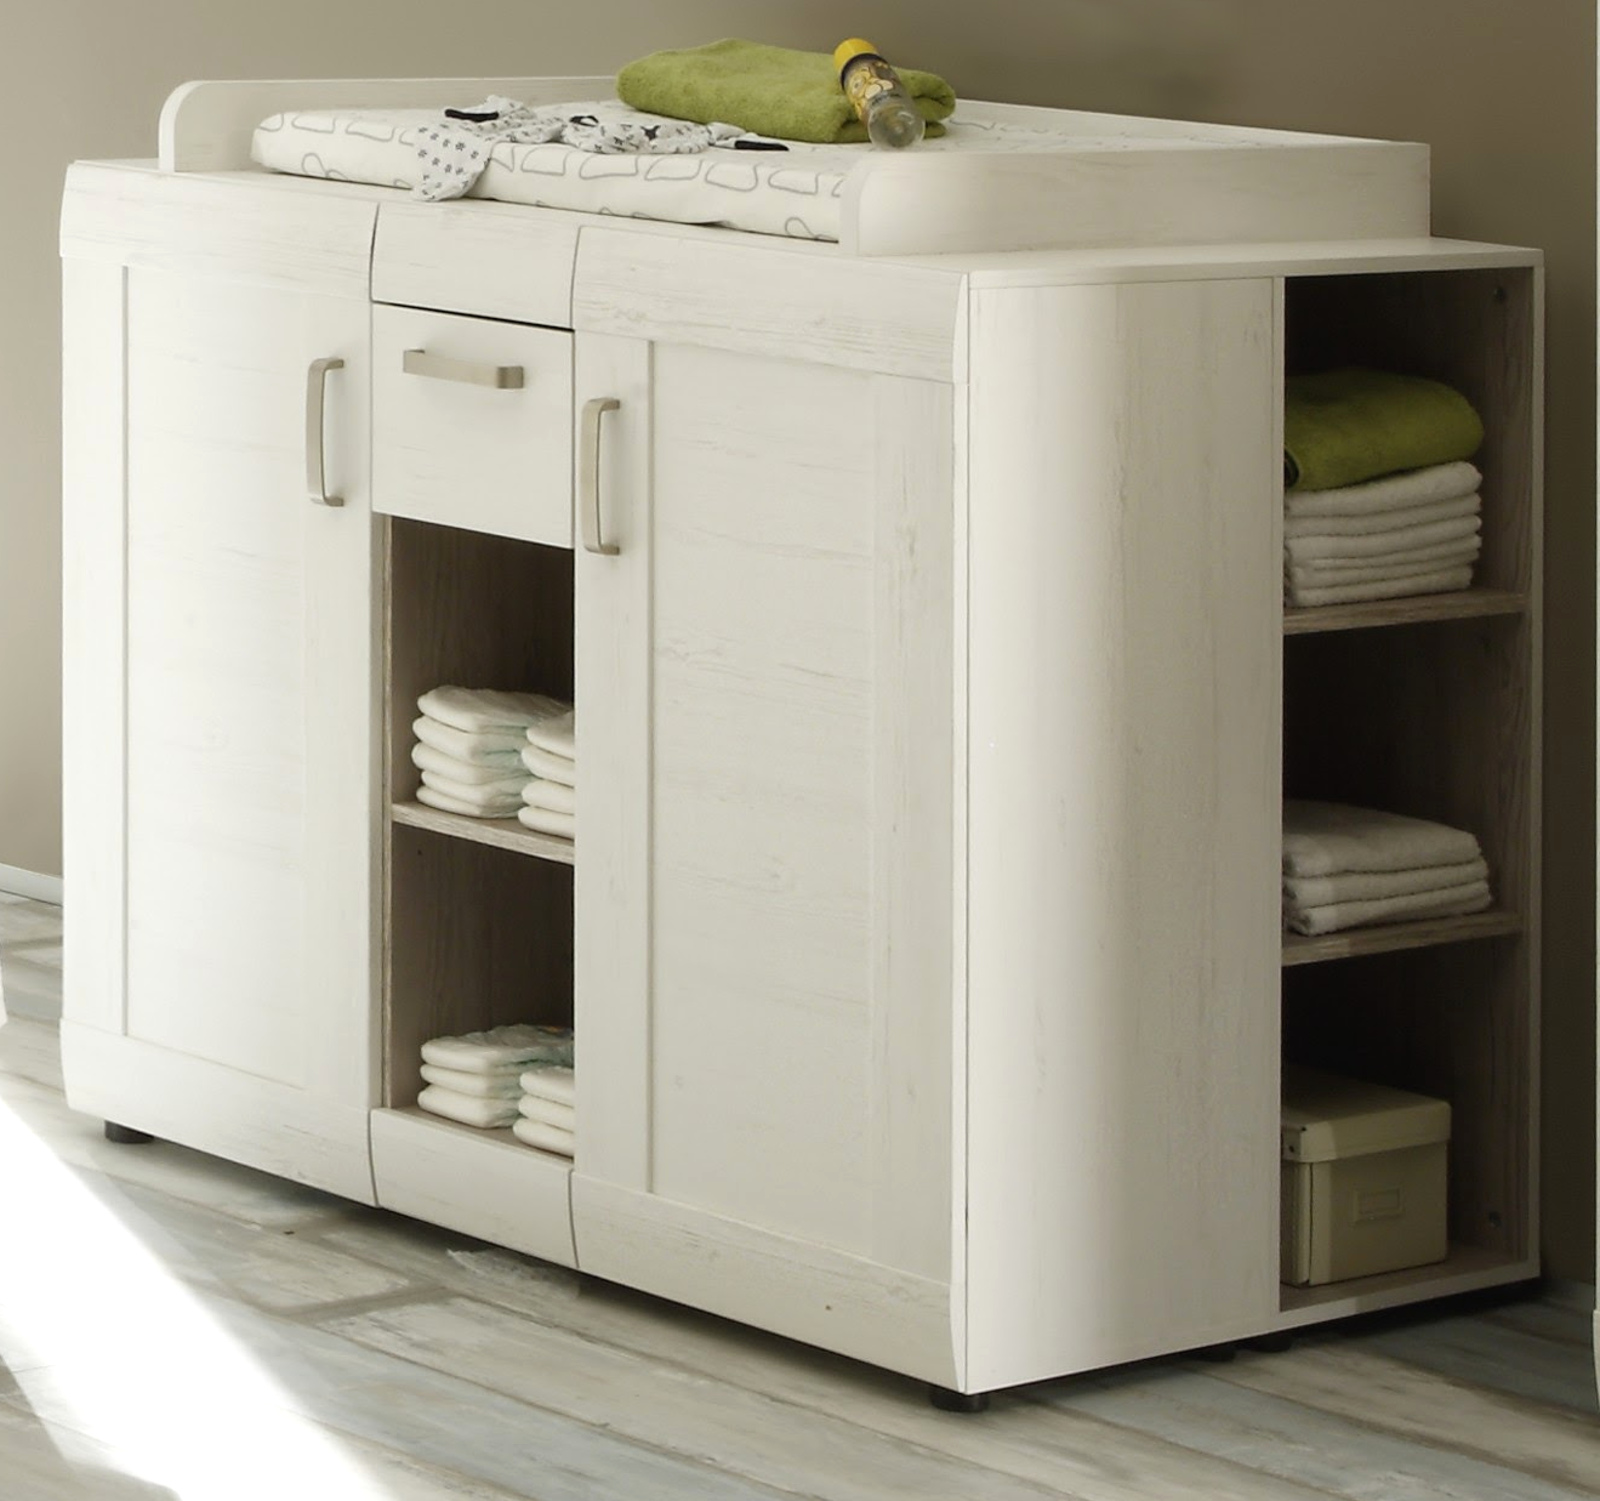 wickelkommode als set in pinie wei. Black Bedroom Furniture Sets. Home Design Ideas